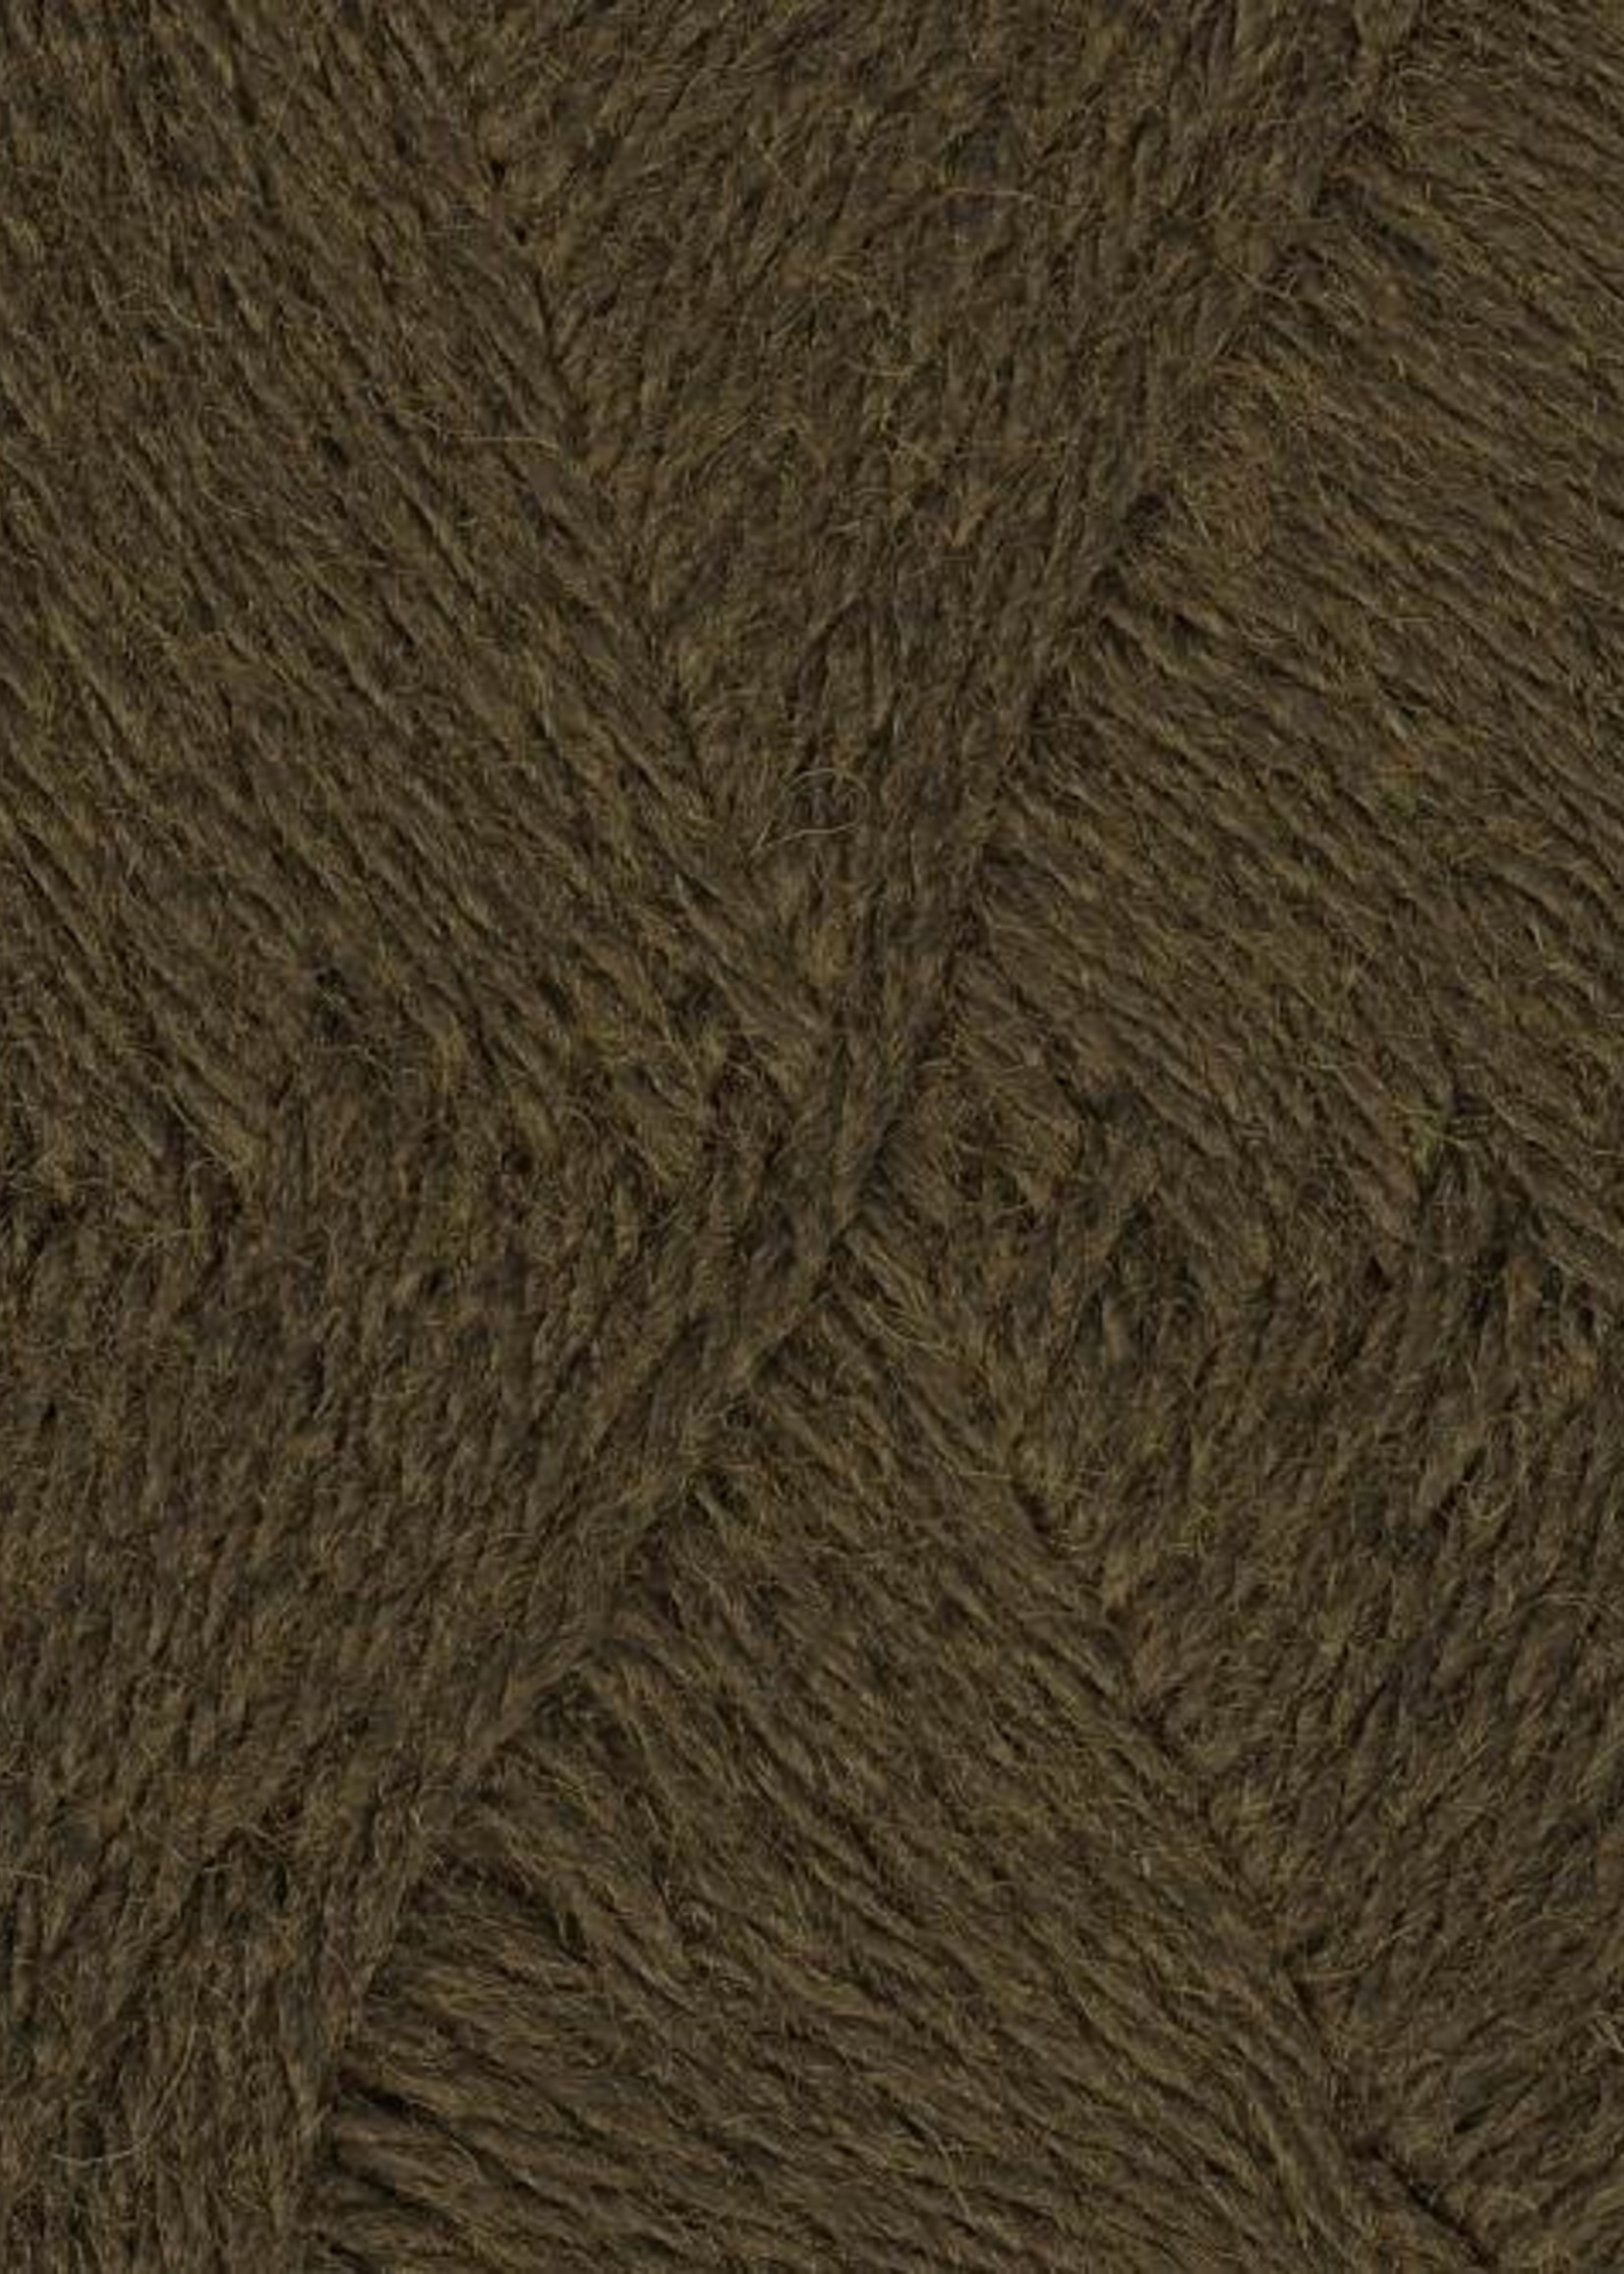 Knitting Fever KFI Collection Teenie Weenie Wool - Moss